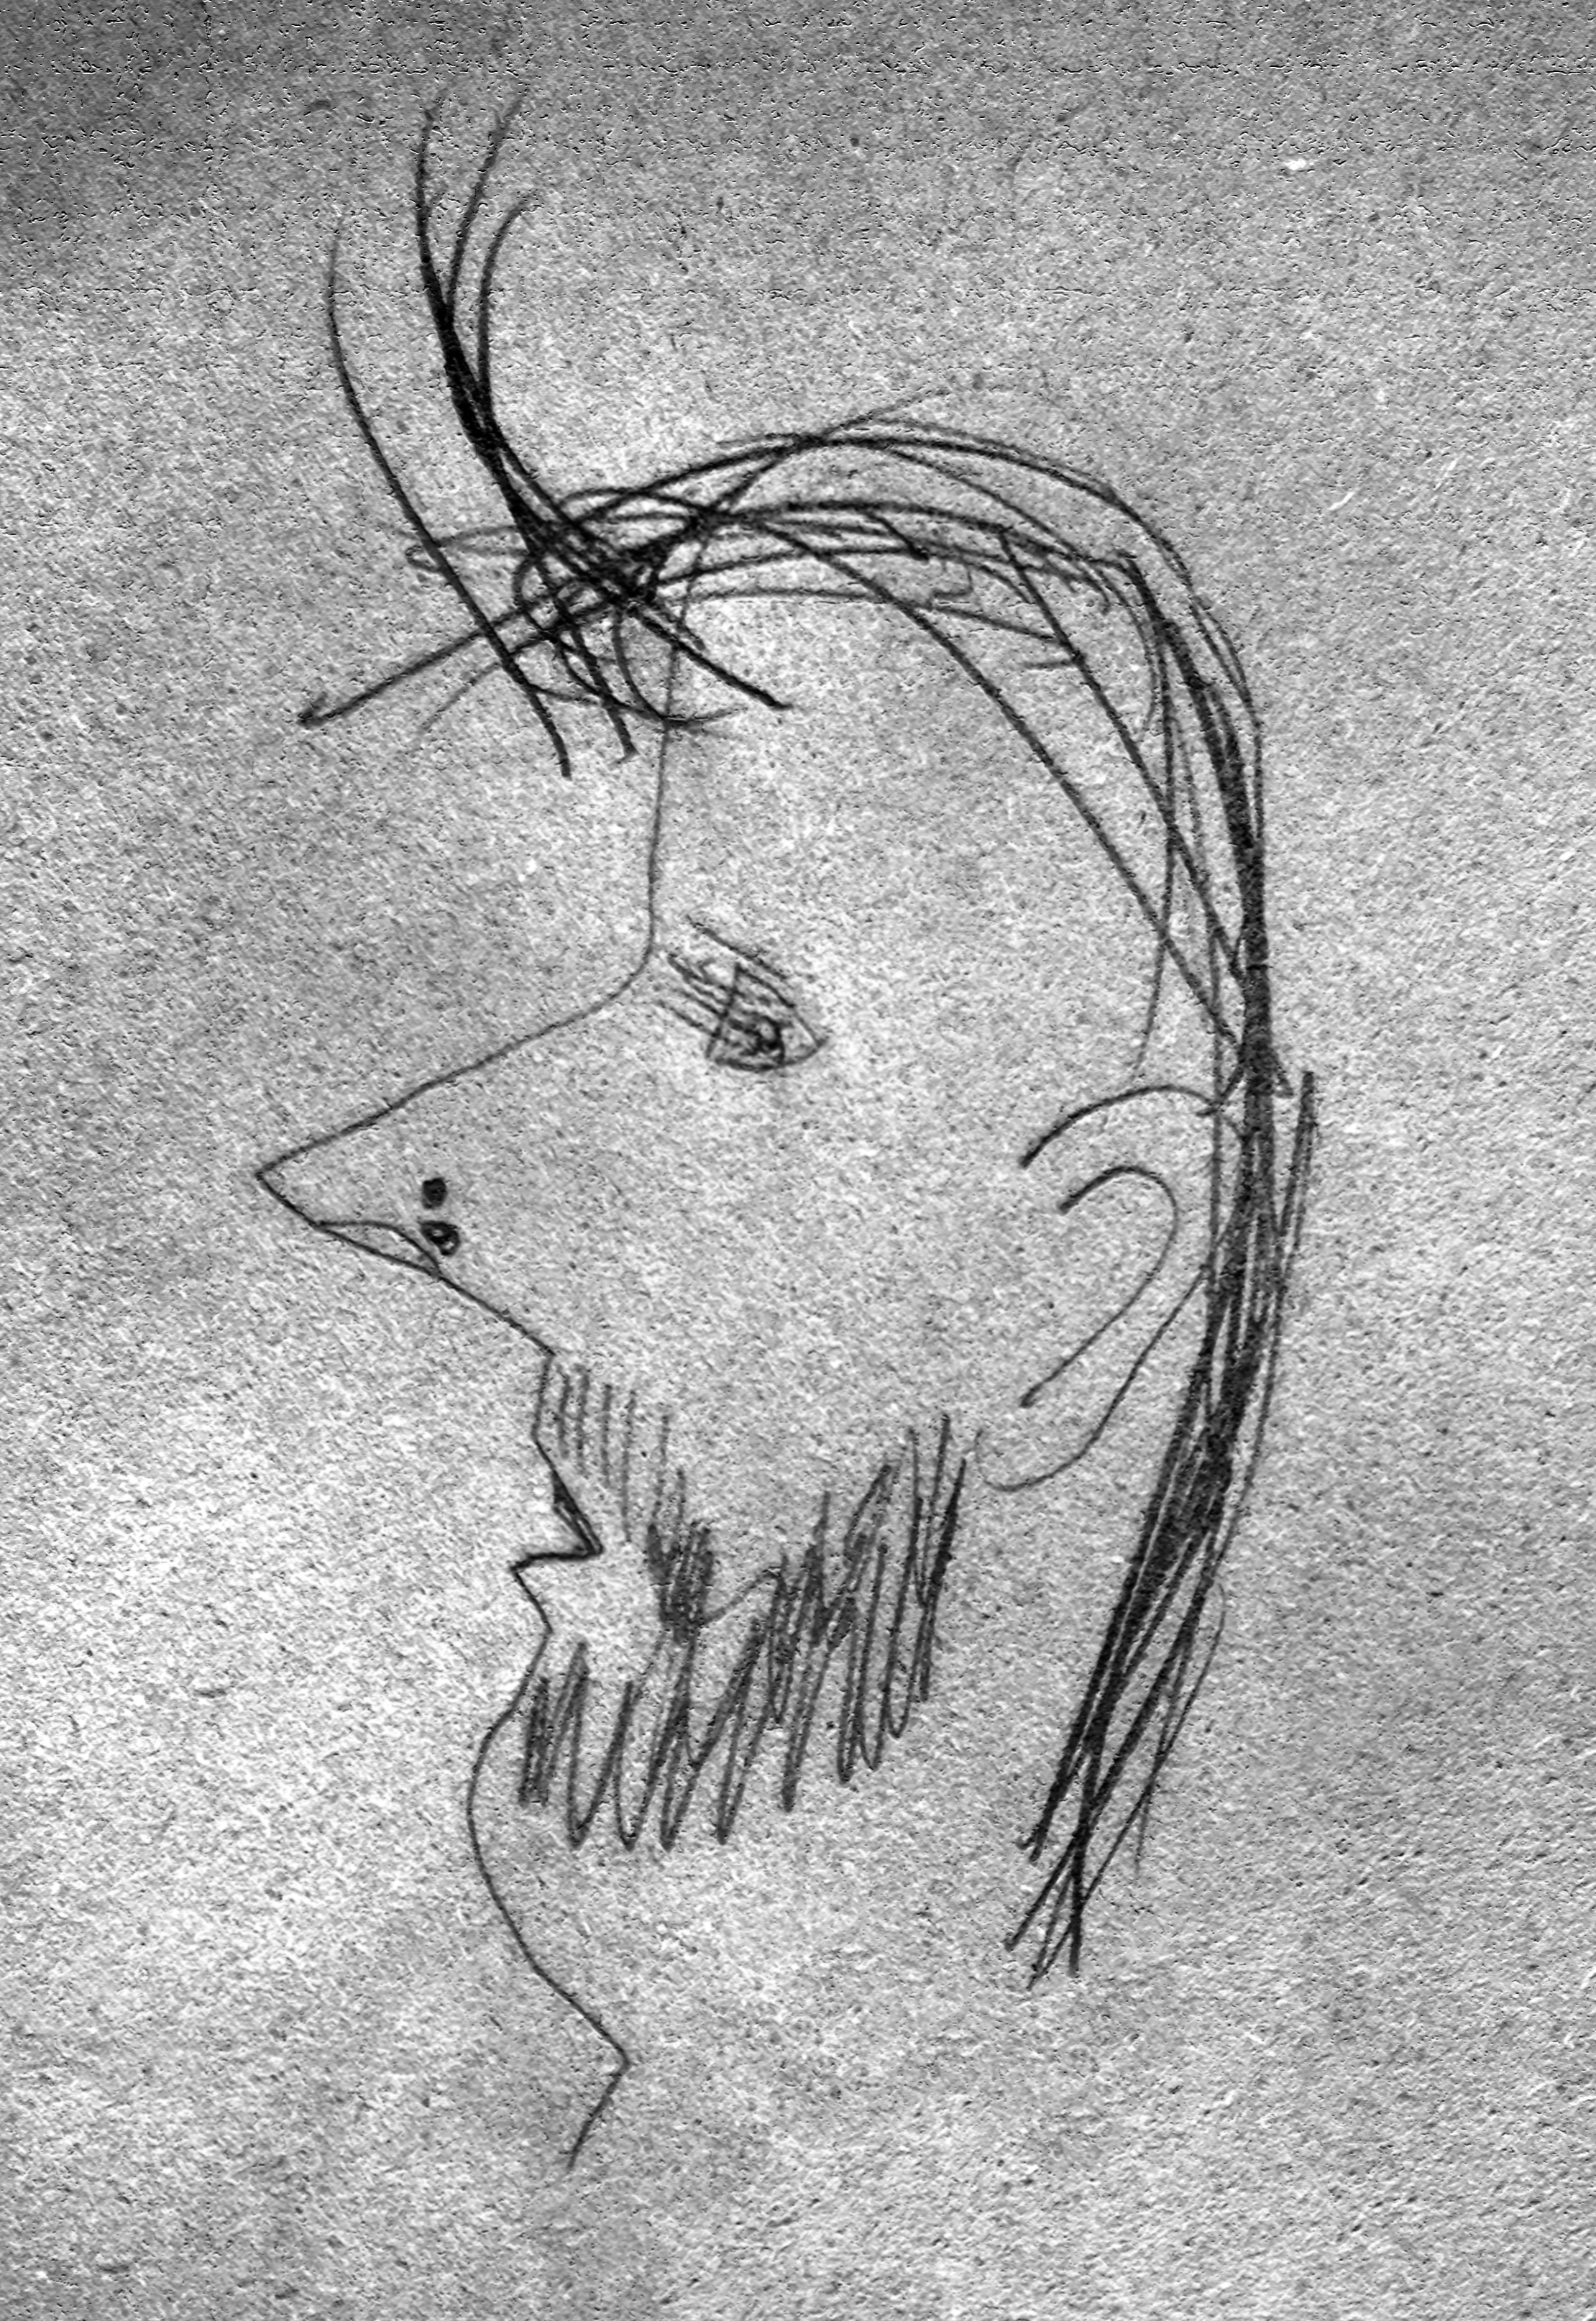 Julia's sketch of me.